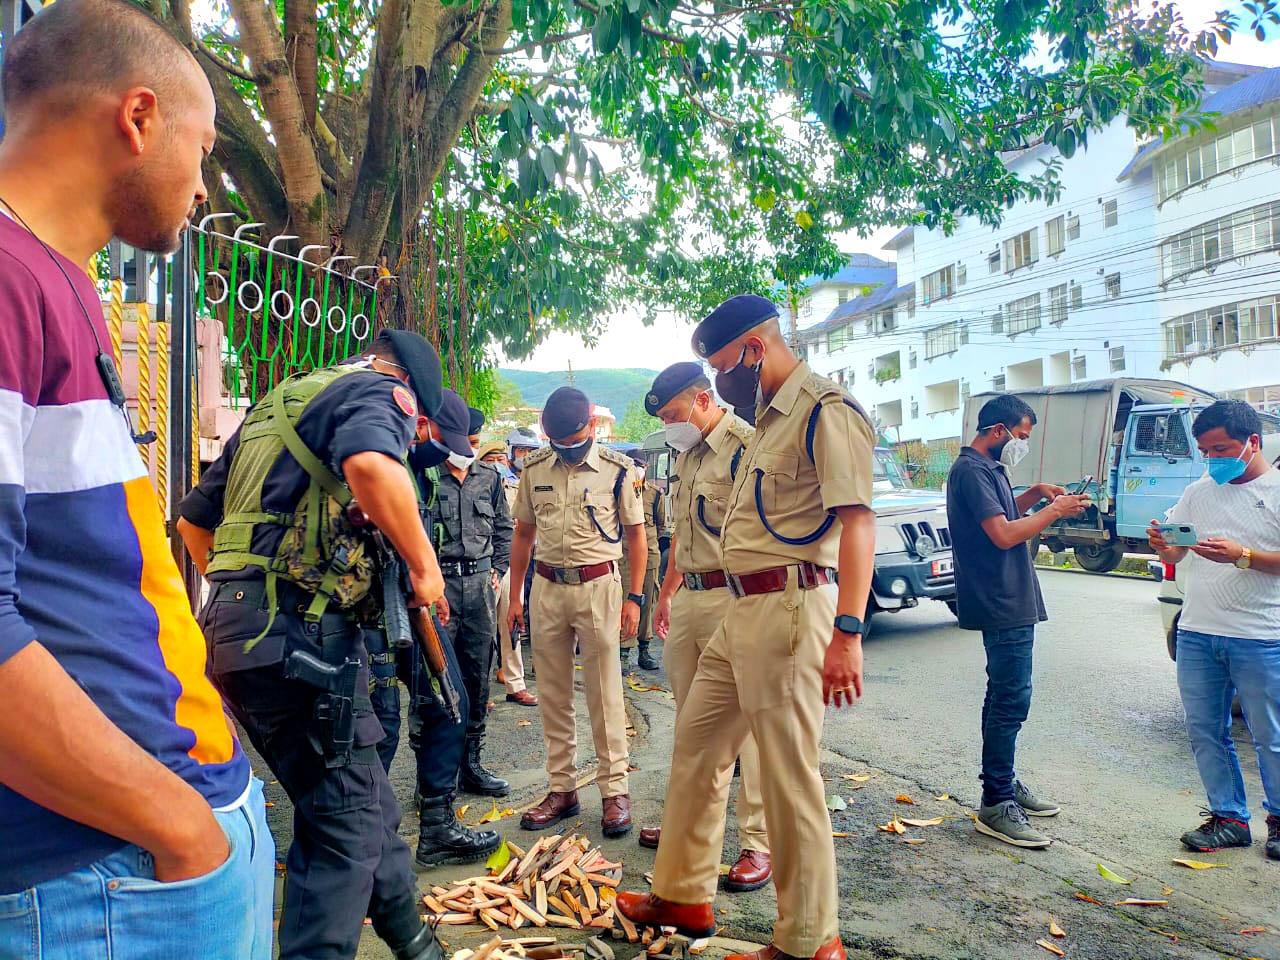 The-group-from-Mawlai-identified-as-Ka-Sur-ki-Paidbah-Ki-Nong-Mawlai-has-surprise-the-police-of-Shil